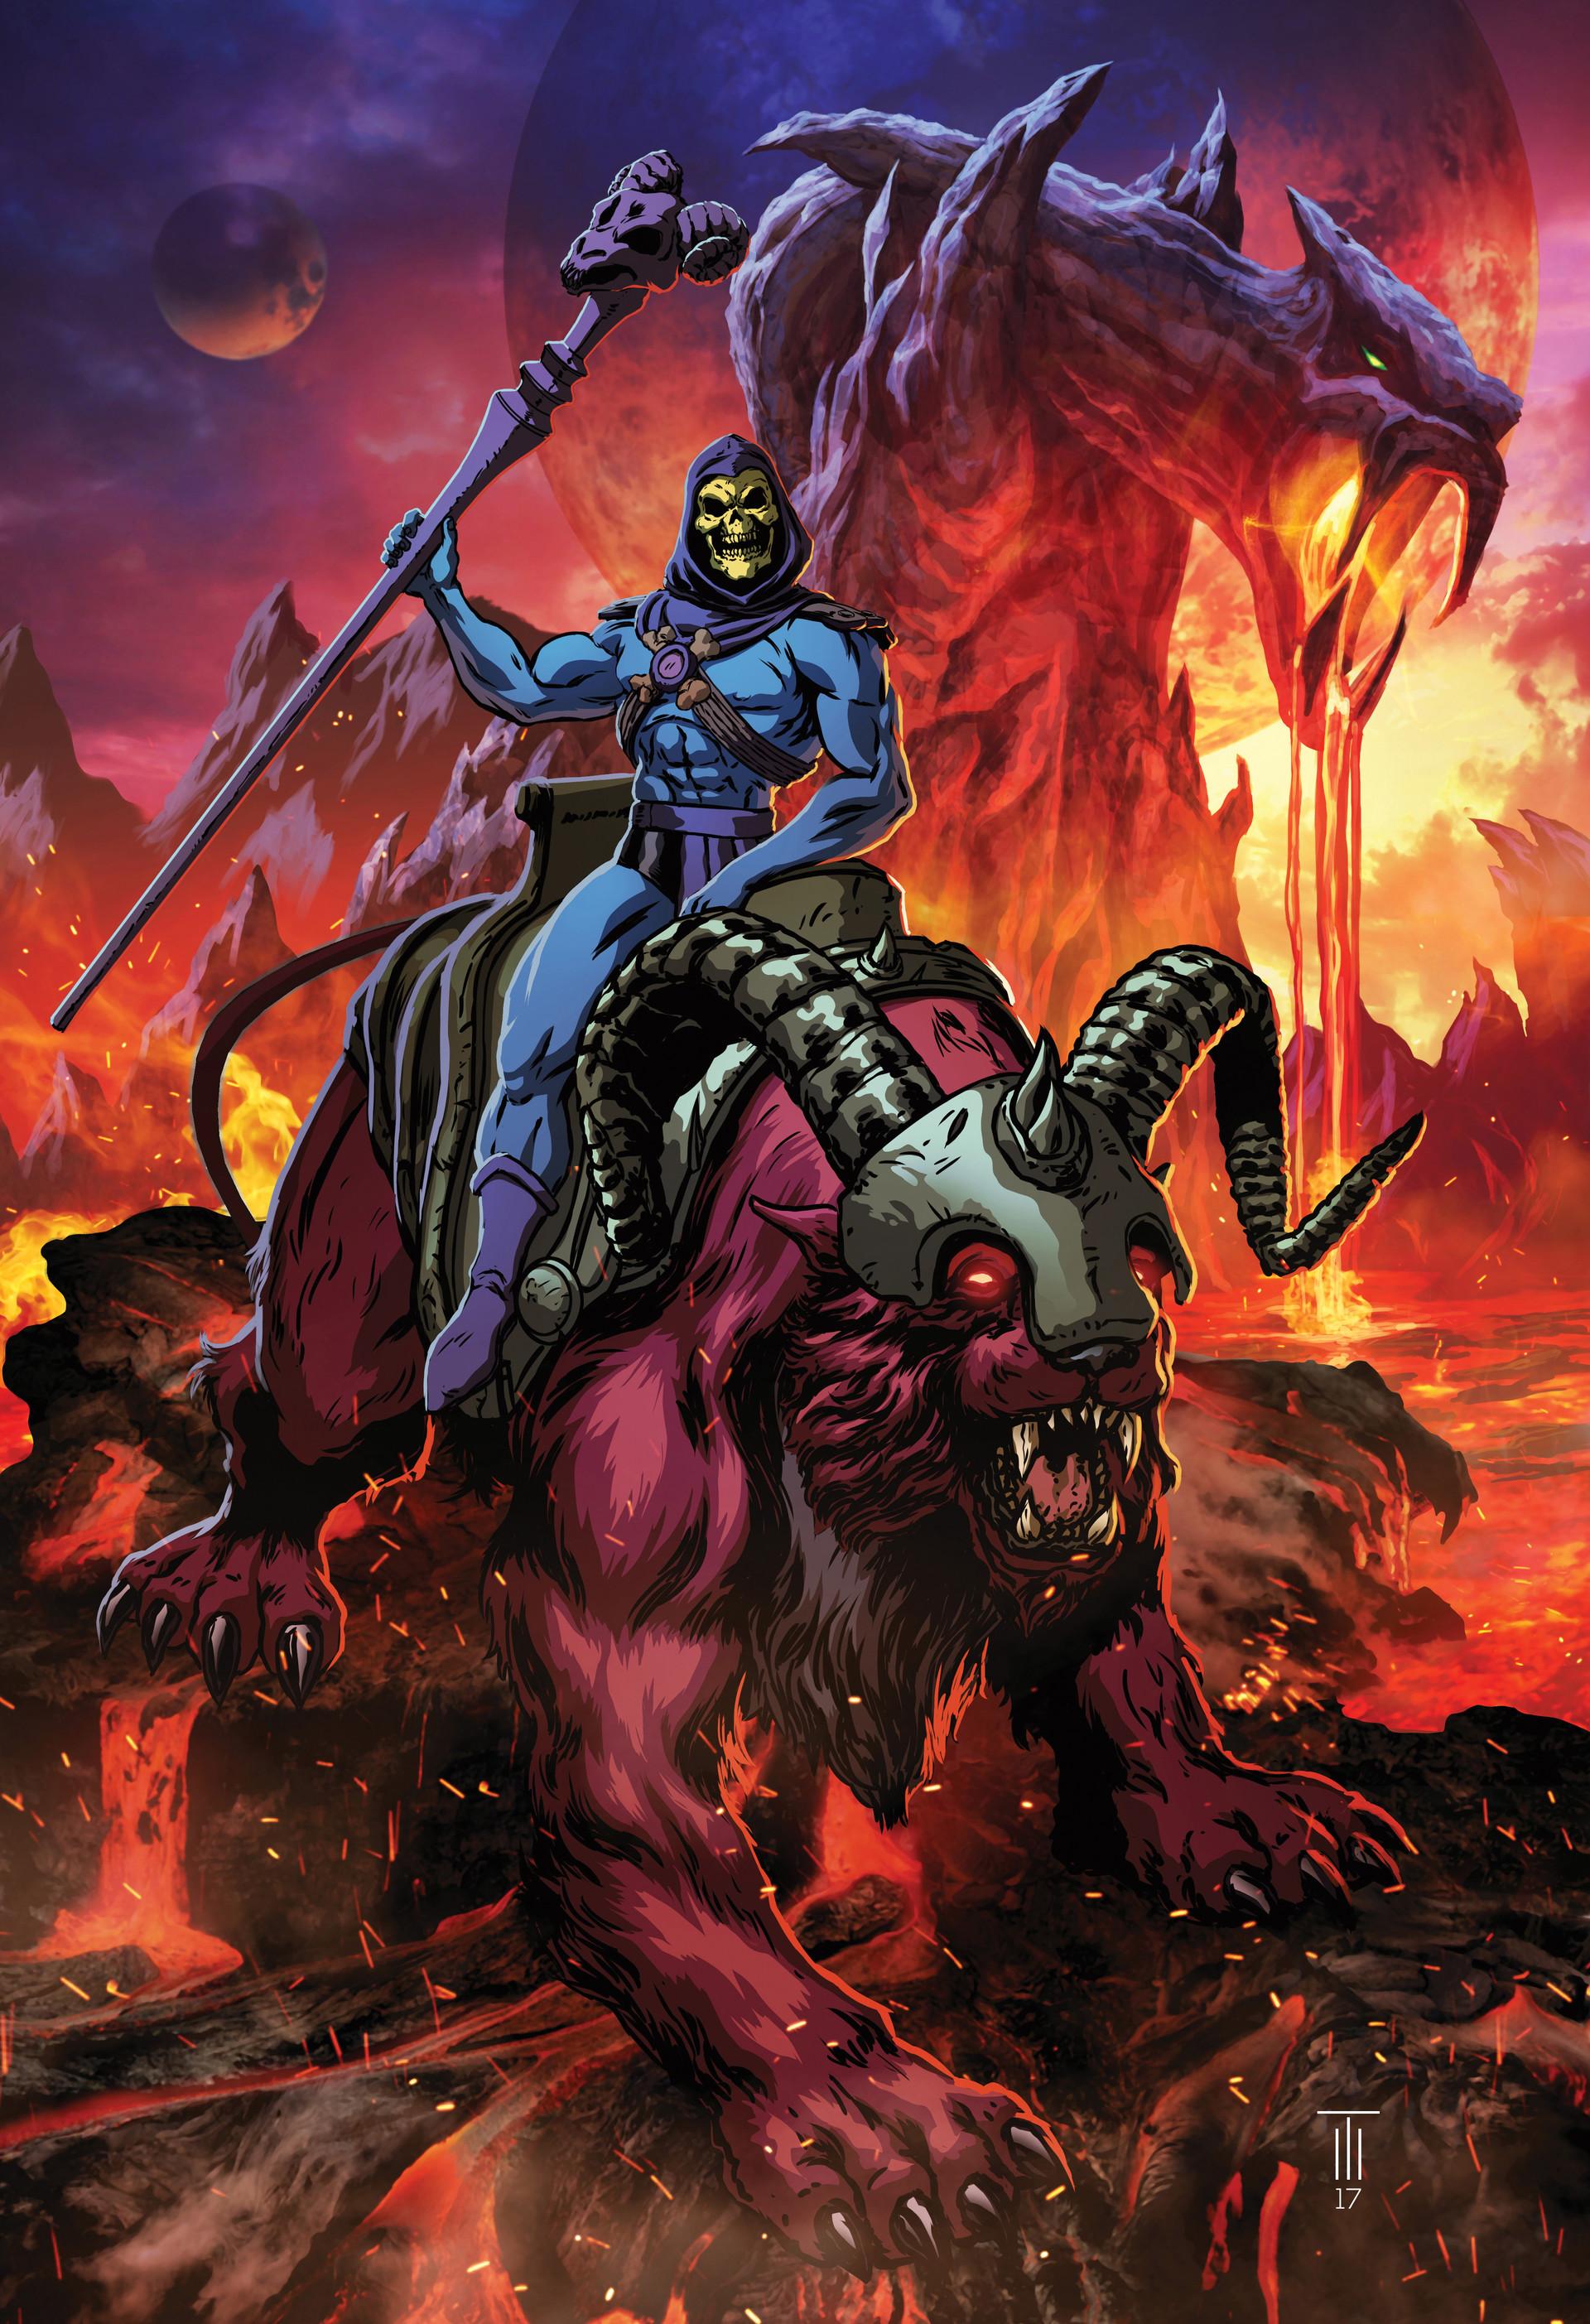 Skeletor and Panthor